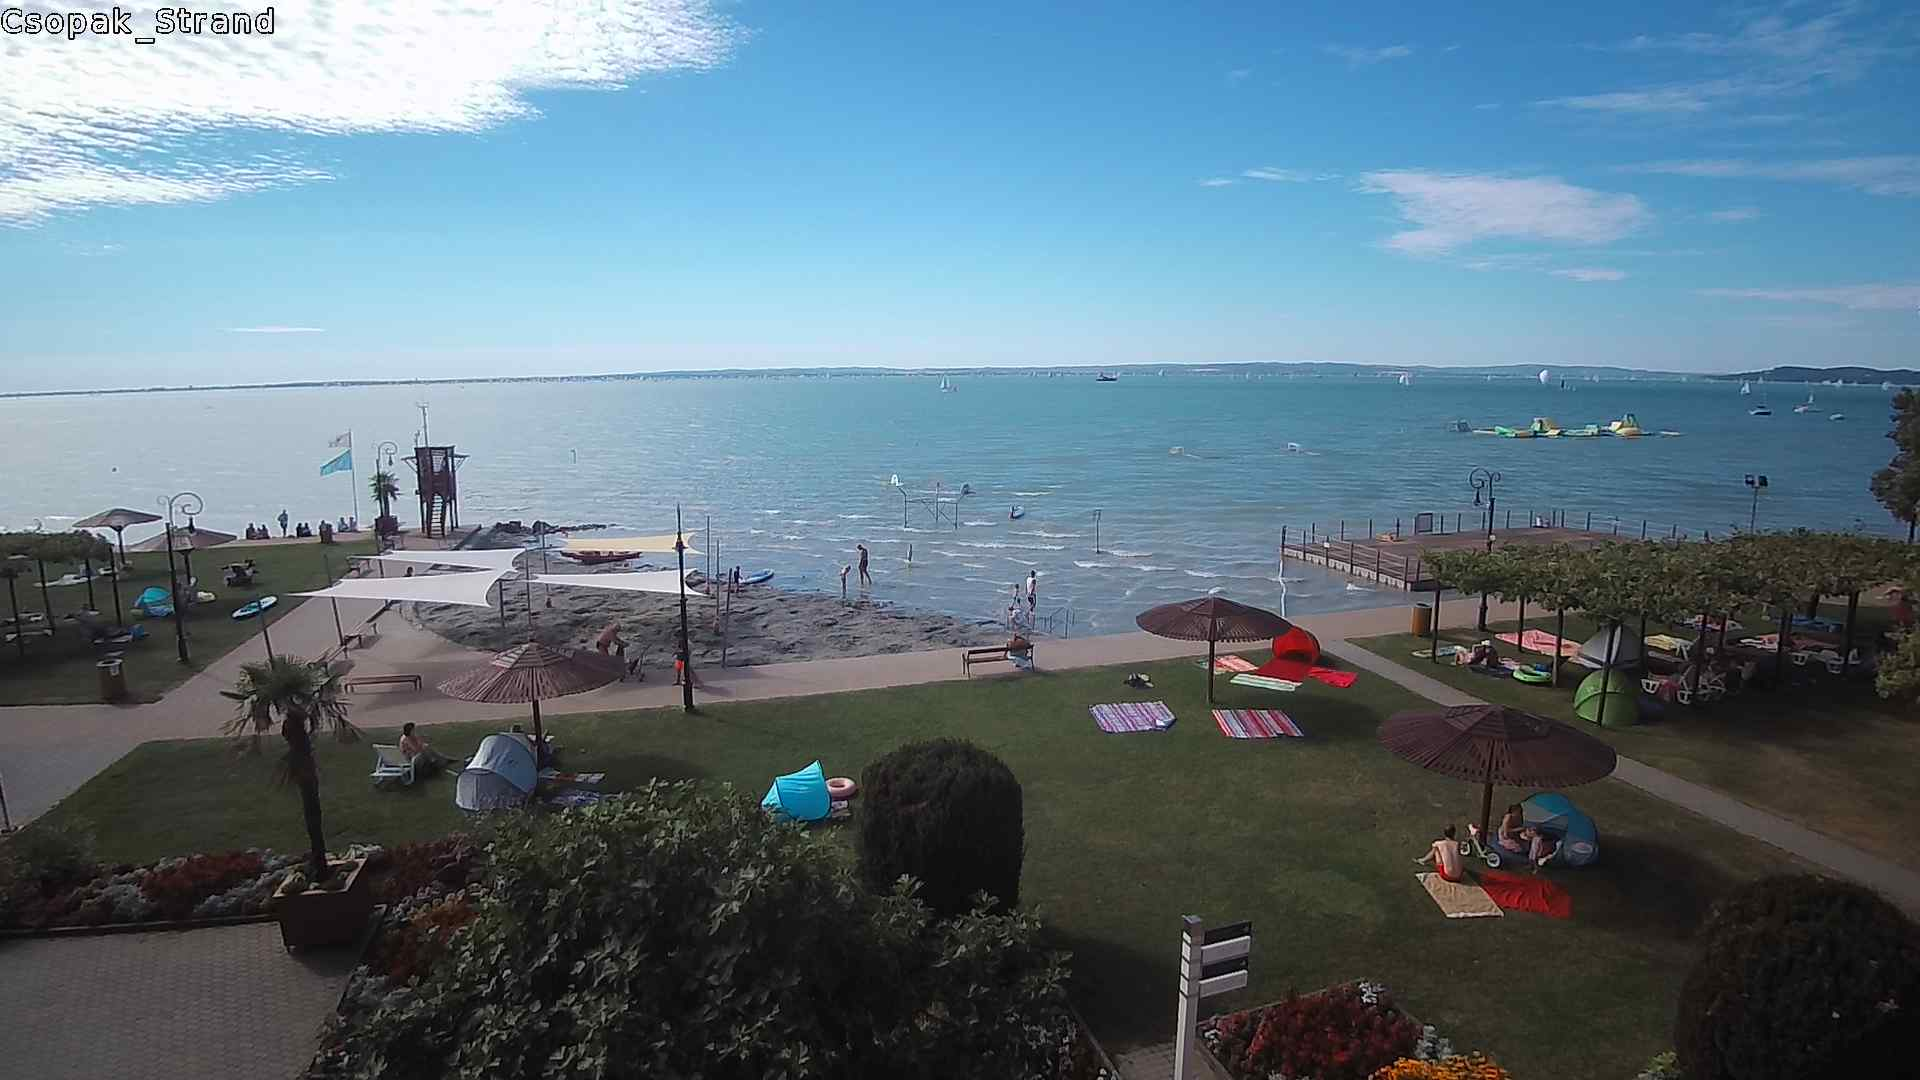 Balatoni webkamerák - Csopaki strand